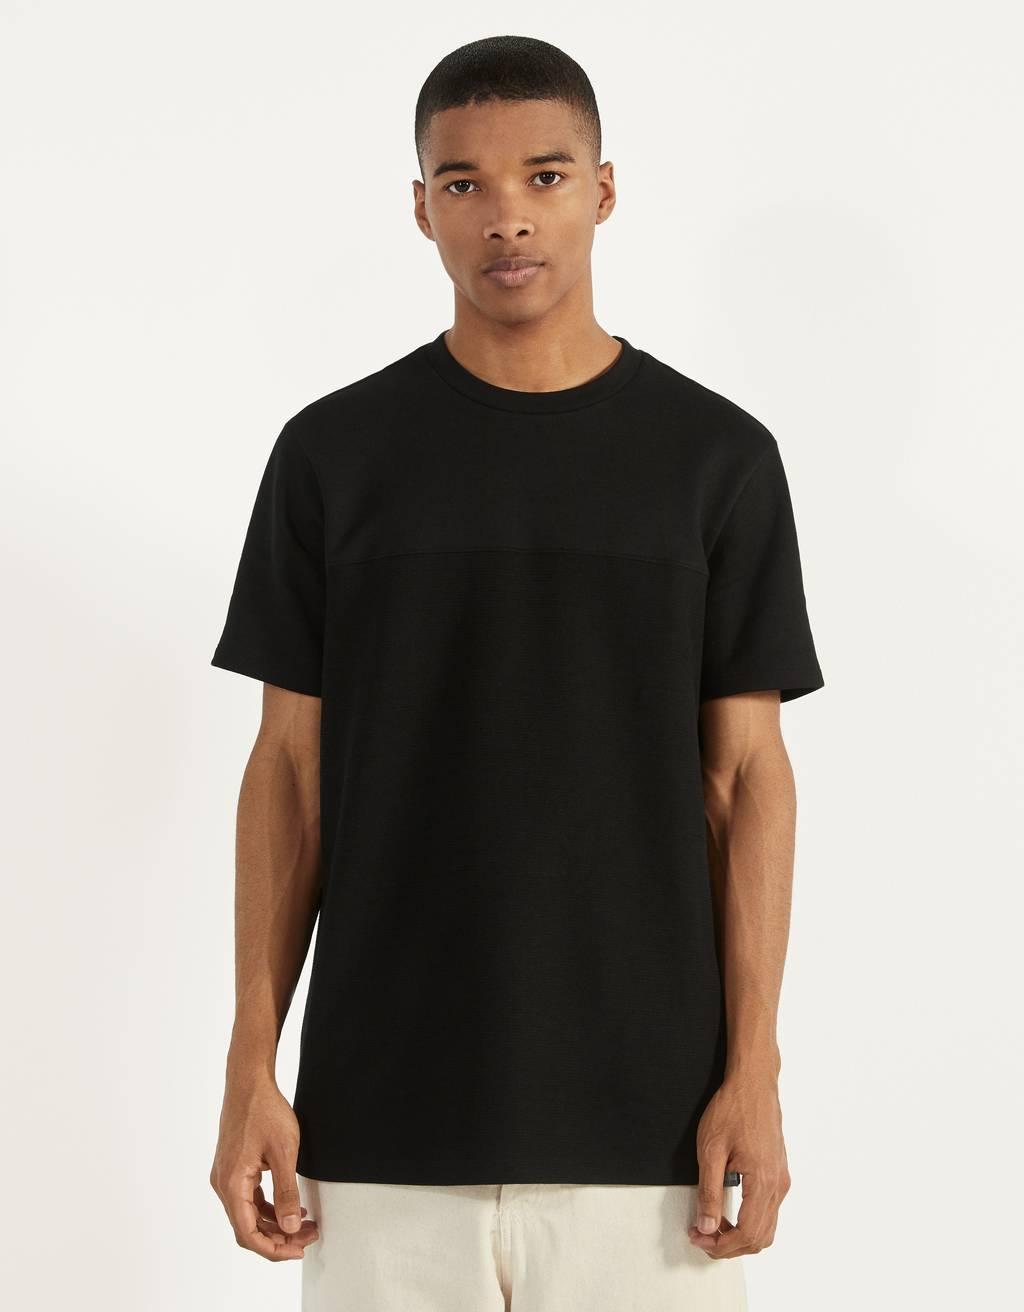 Kombiniertes Strick-Shirt